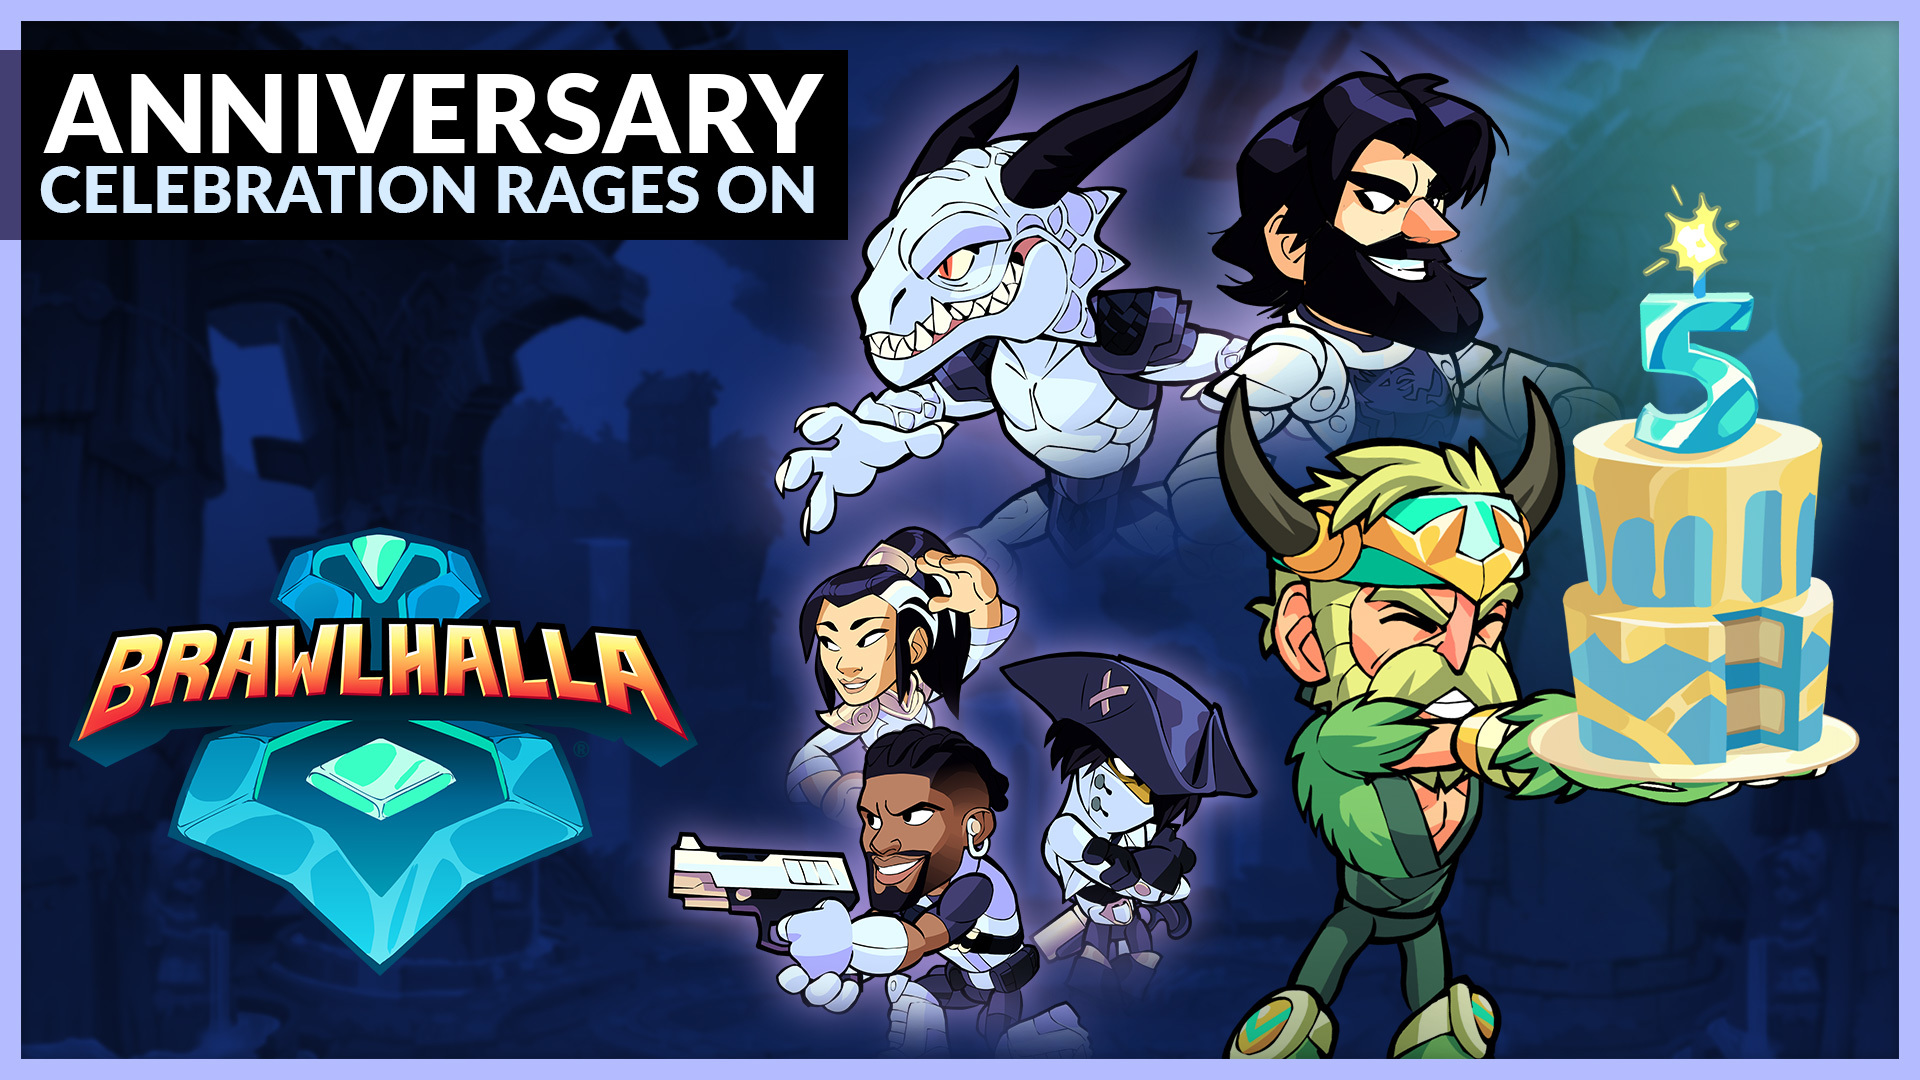 Celebrate Five Years of Brawlhalla!